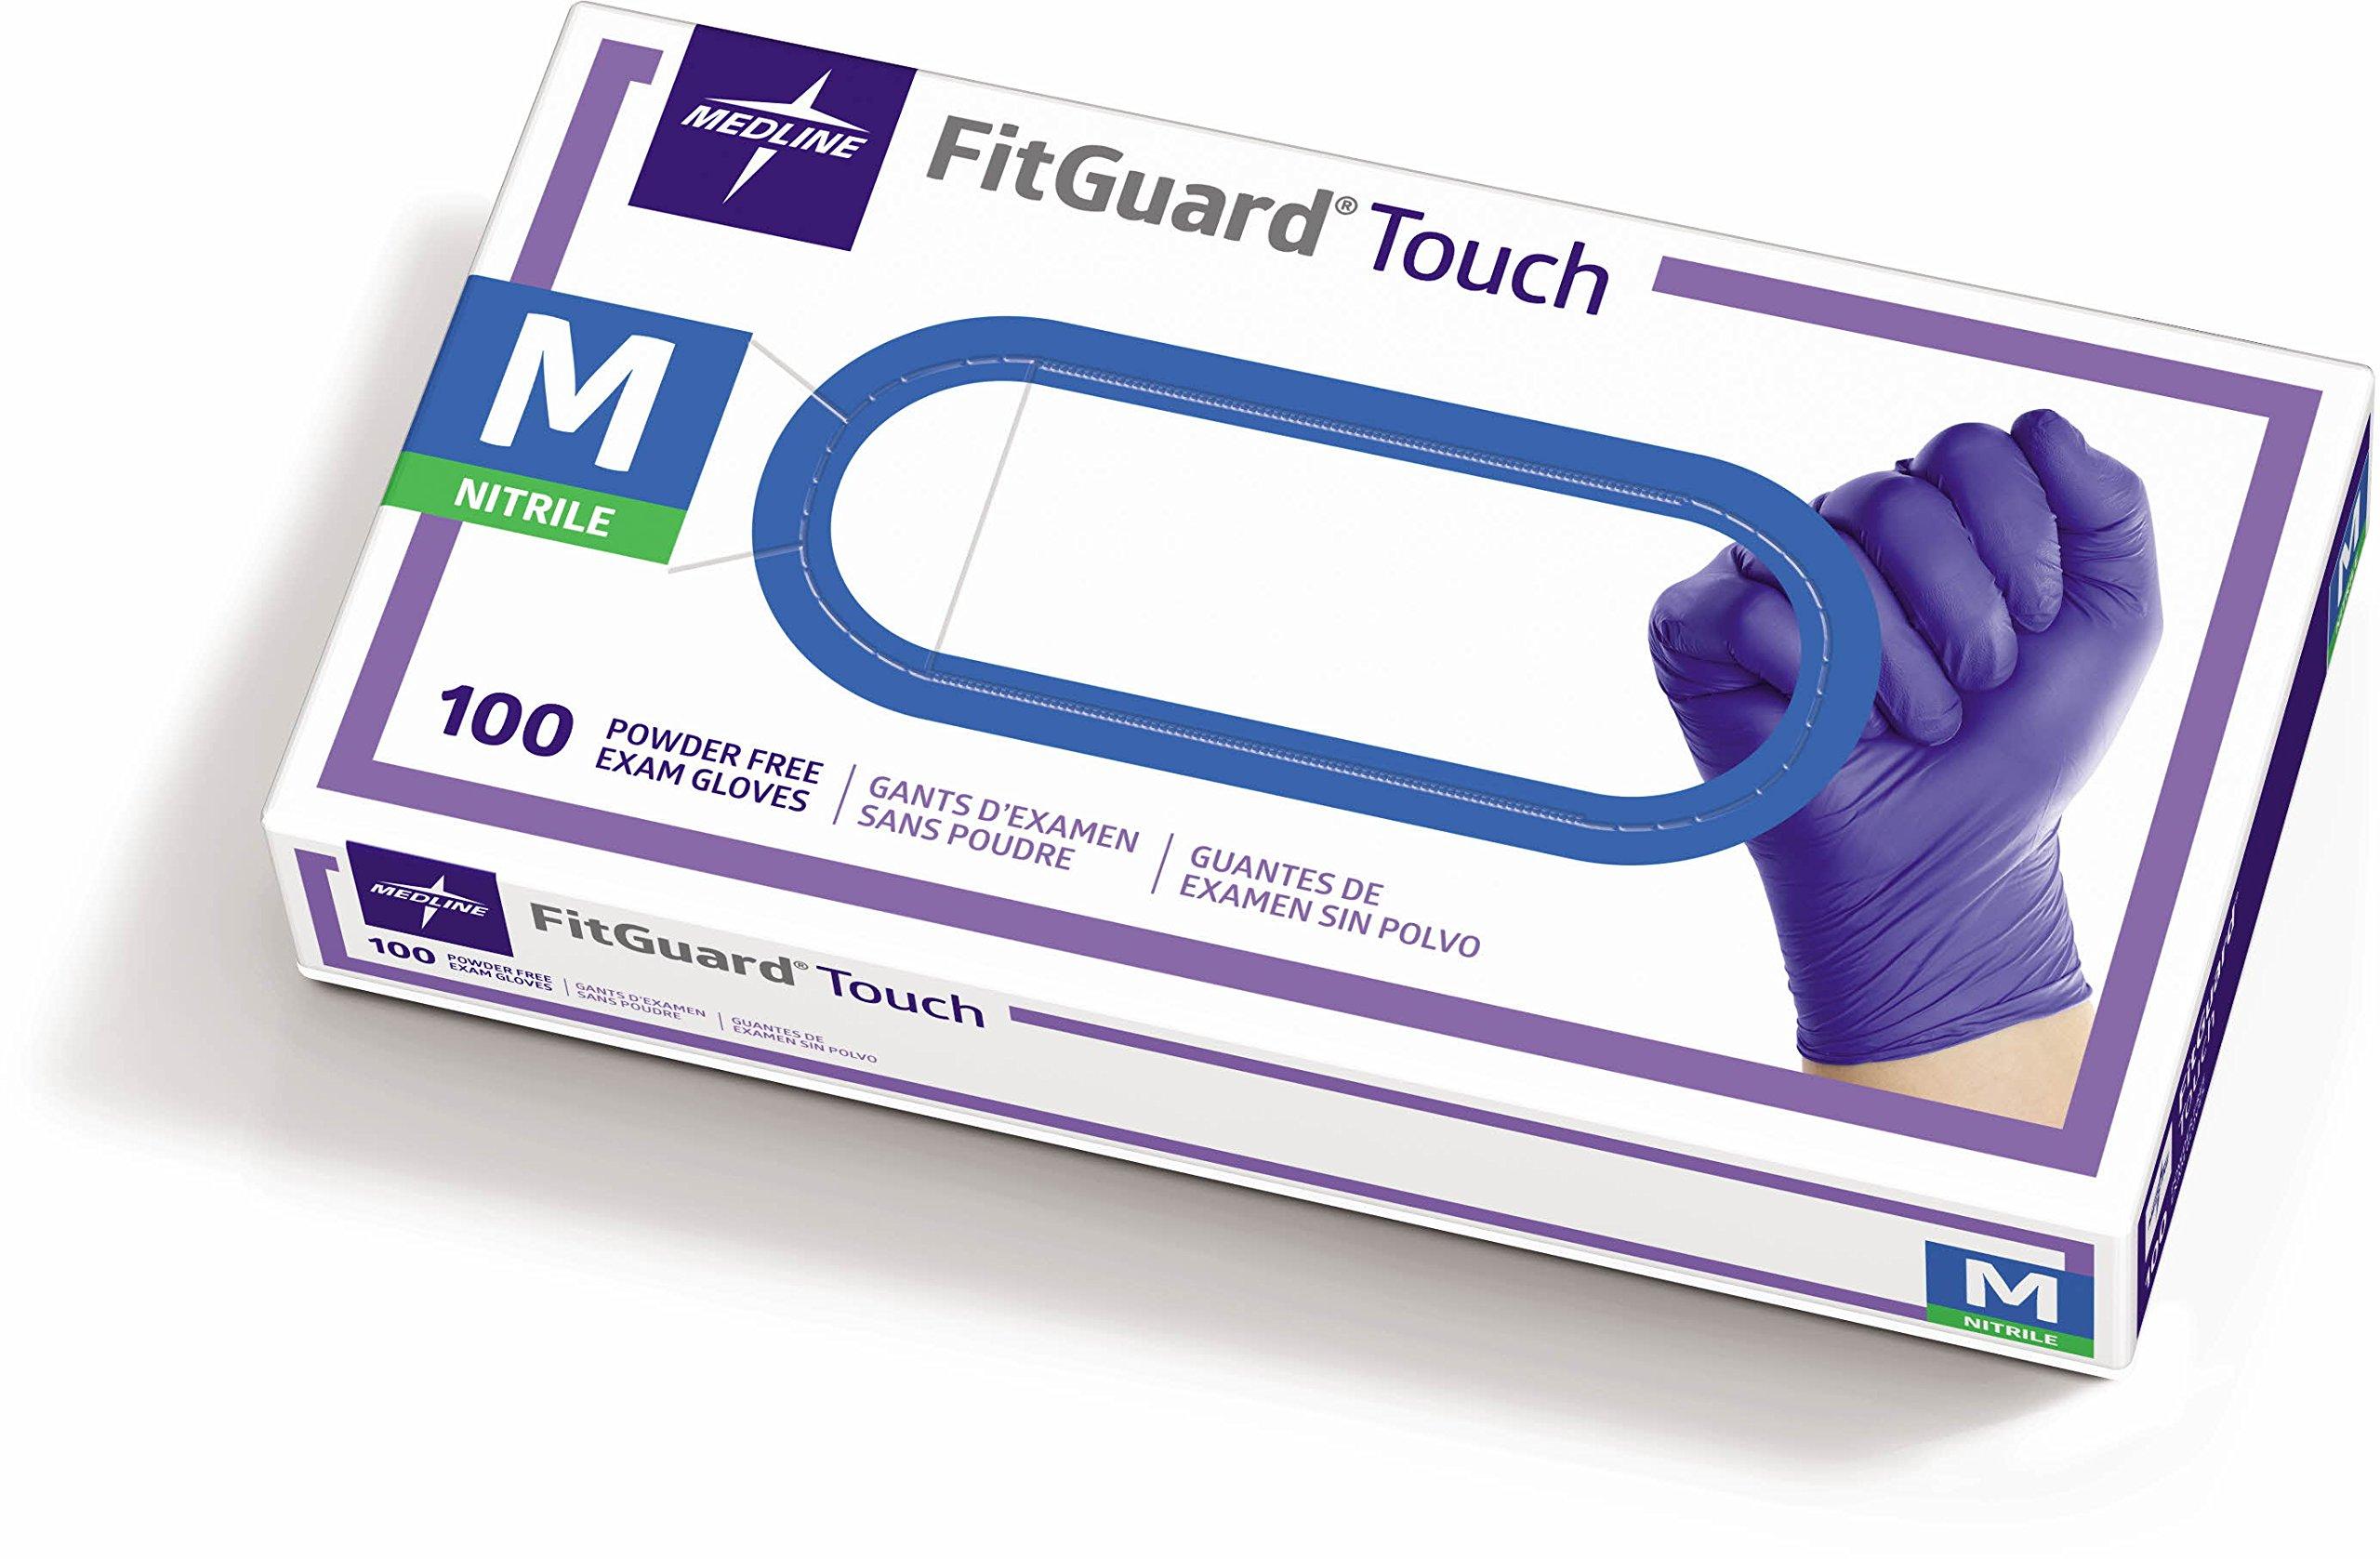 Medline FitGuard Touch Nitrile, Latex Free, Powder Free, Exam Gloves, Blue, Medium (100 Count)